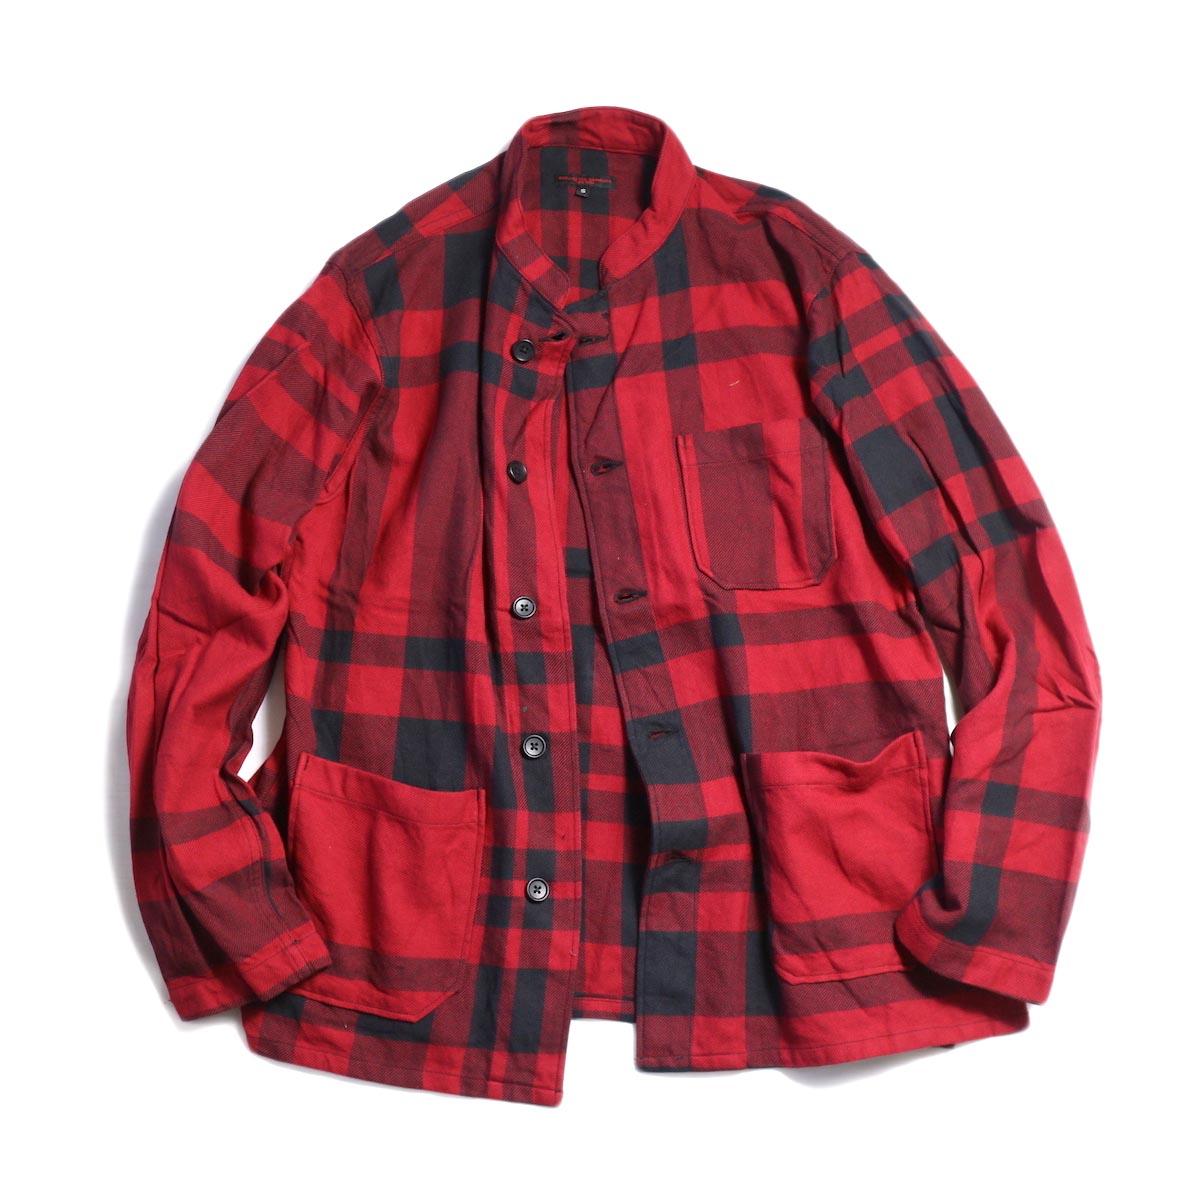 Engineered Garments / Dayton Shirt - Big Plaid